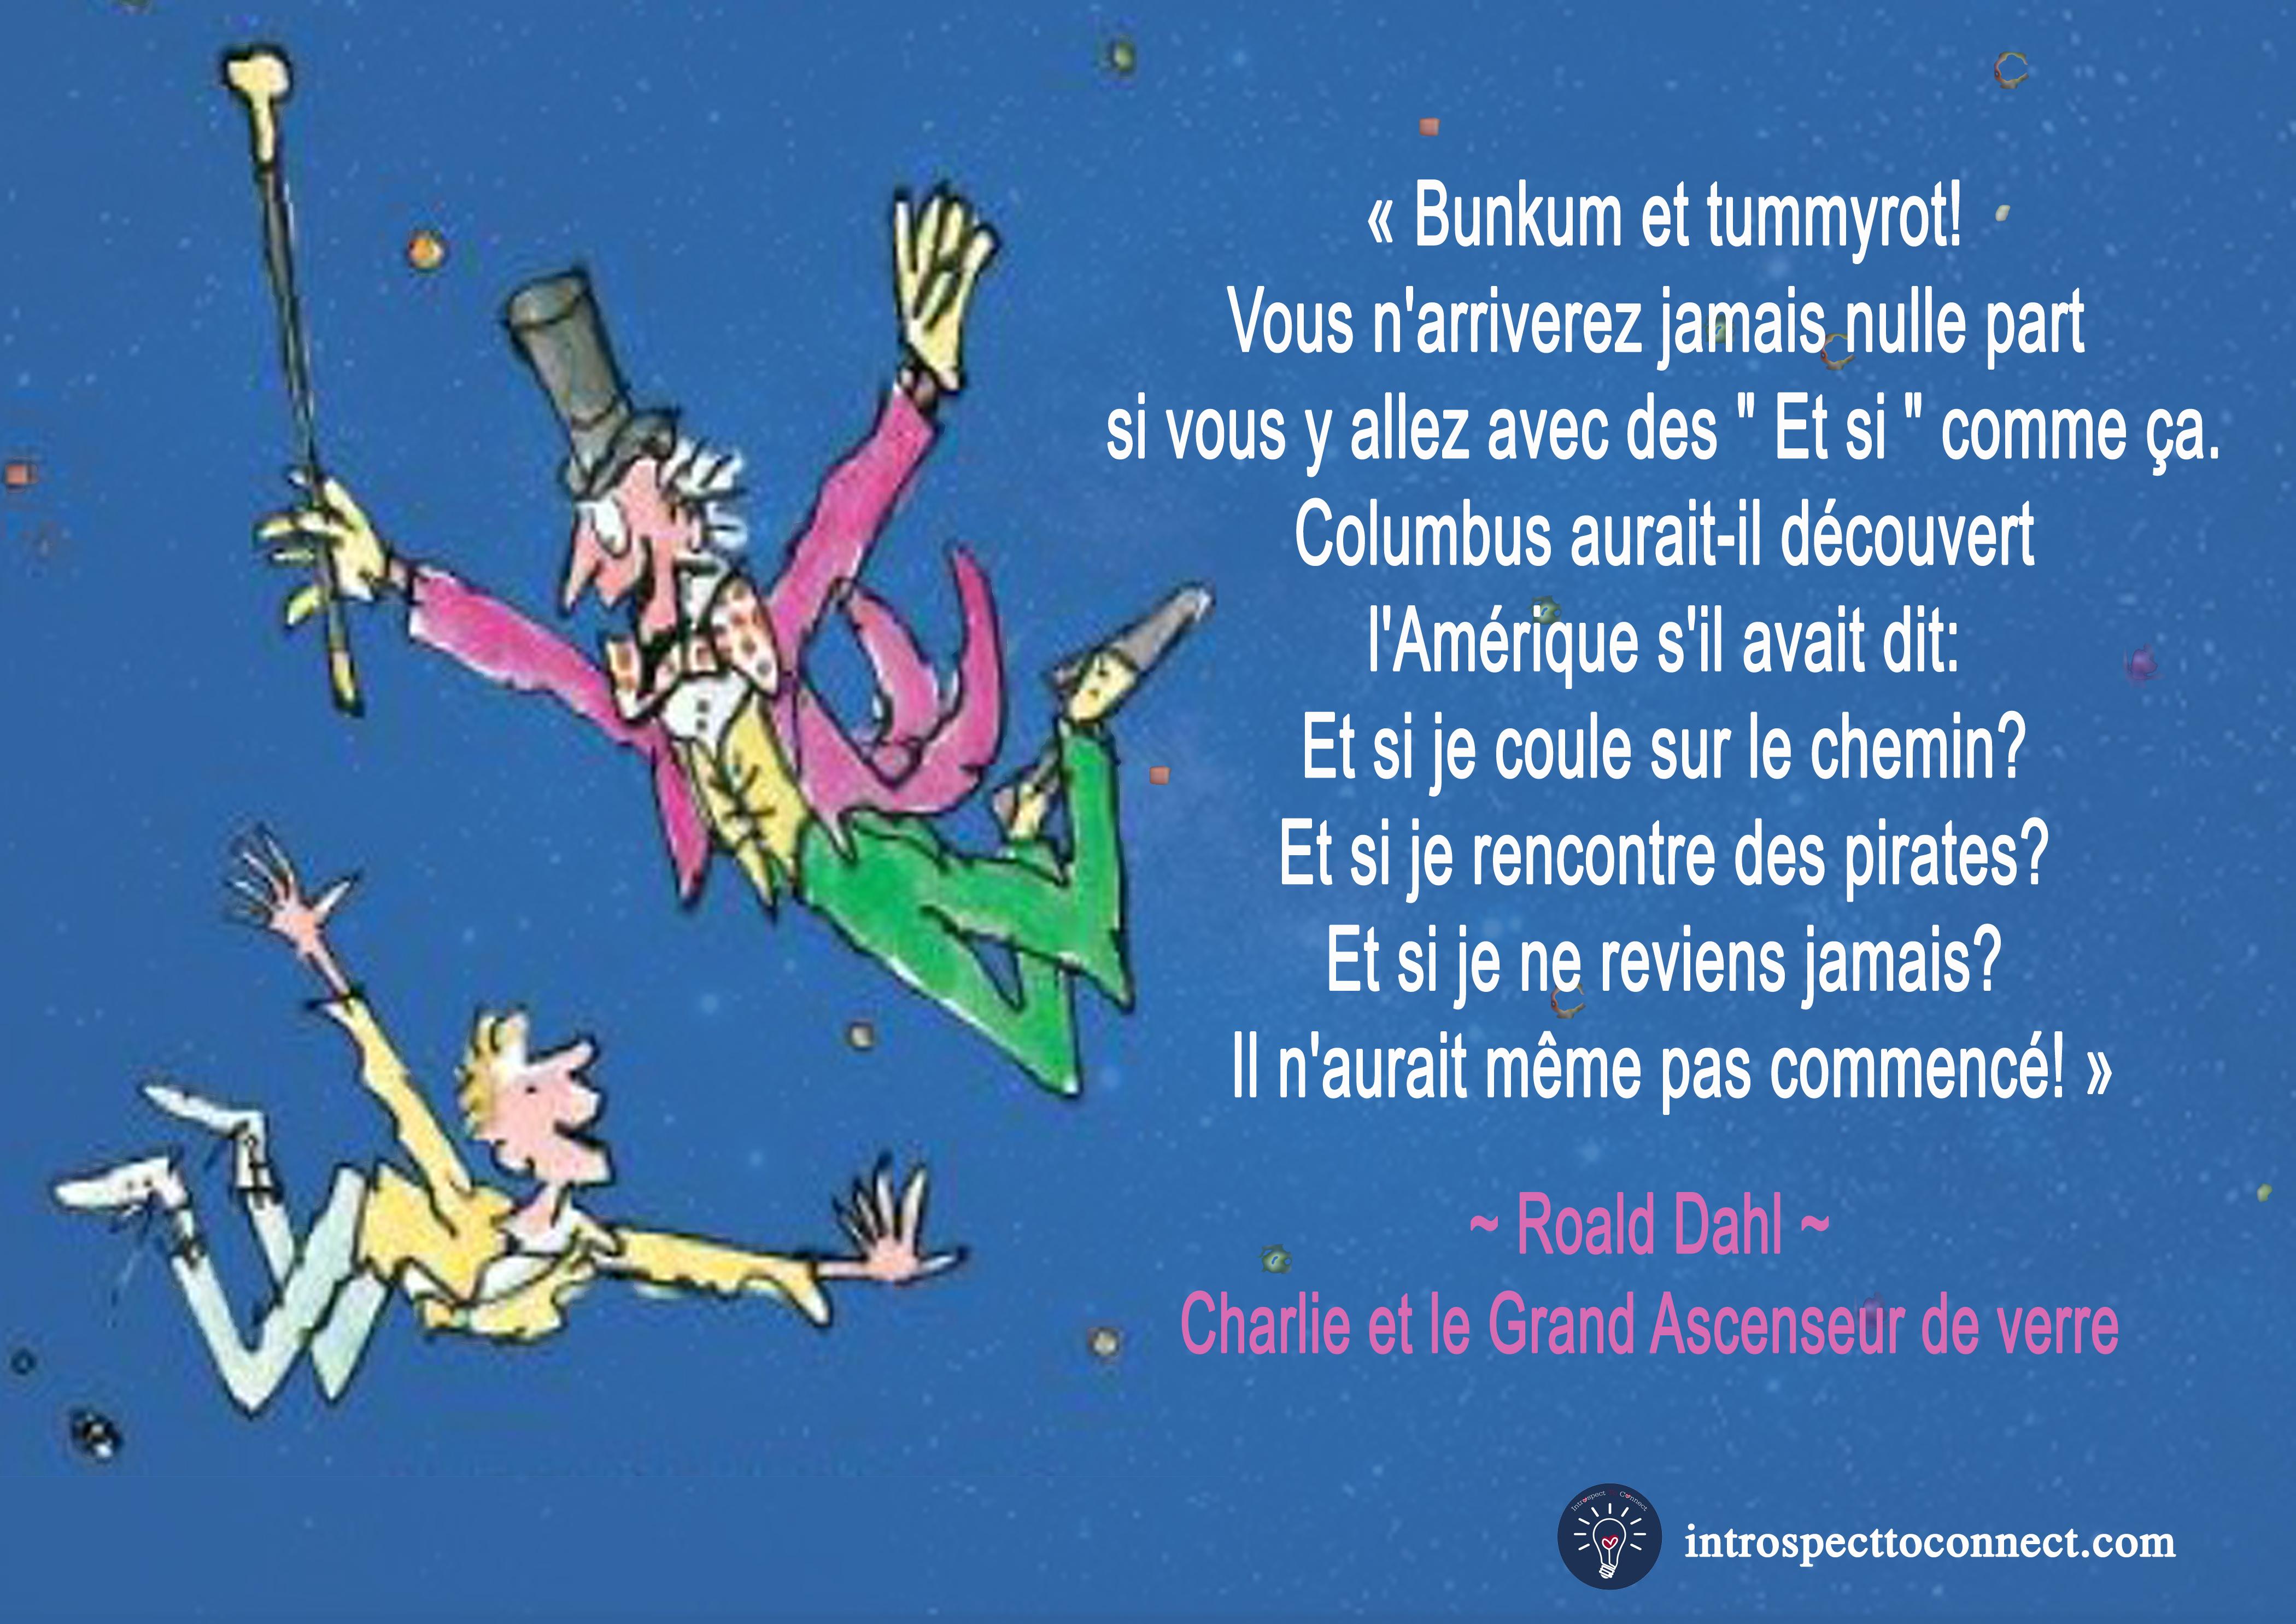 Roald dahl 2 citation copie 3